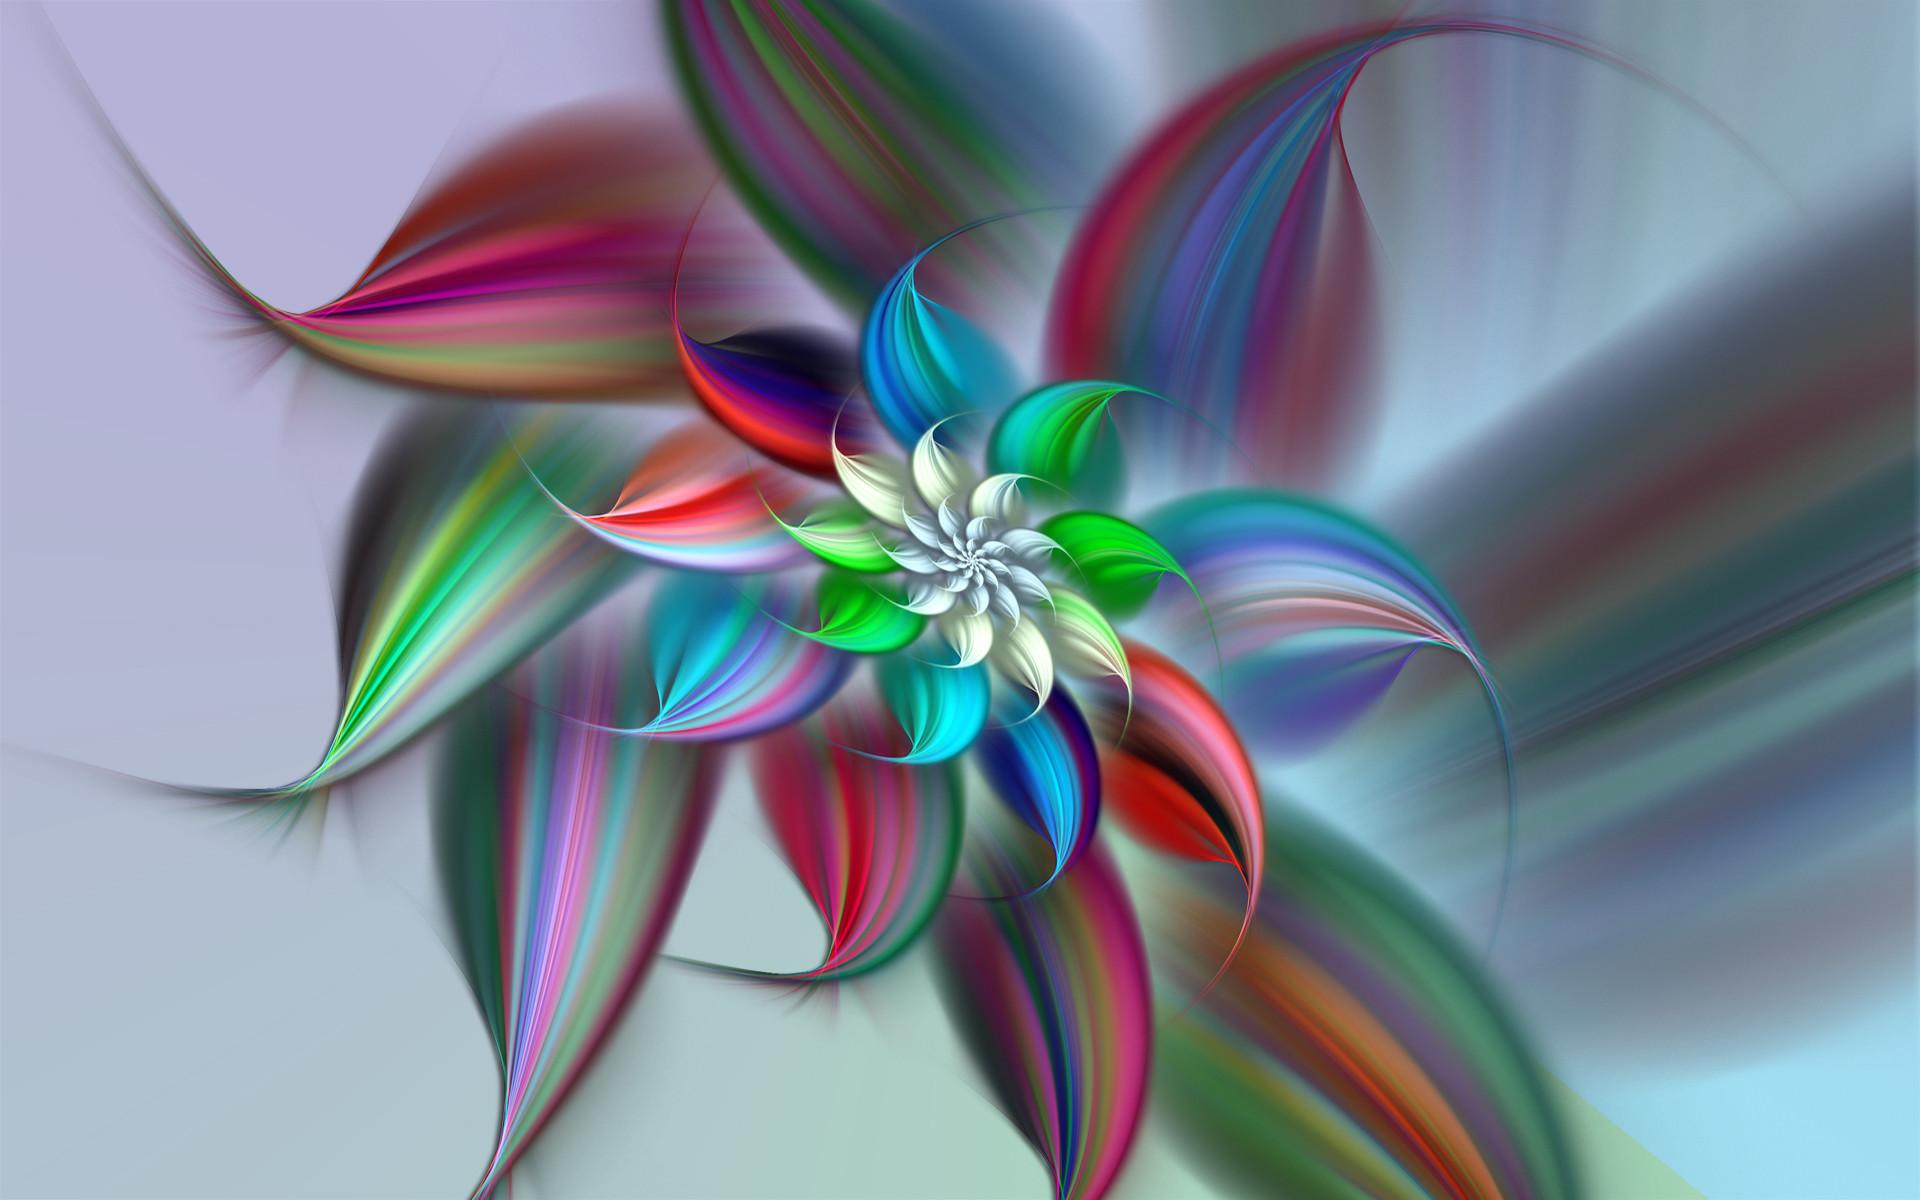 April Flowers 0 HTML code. April Flowers Wallpaper